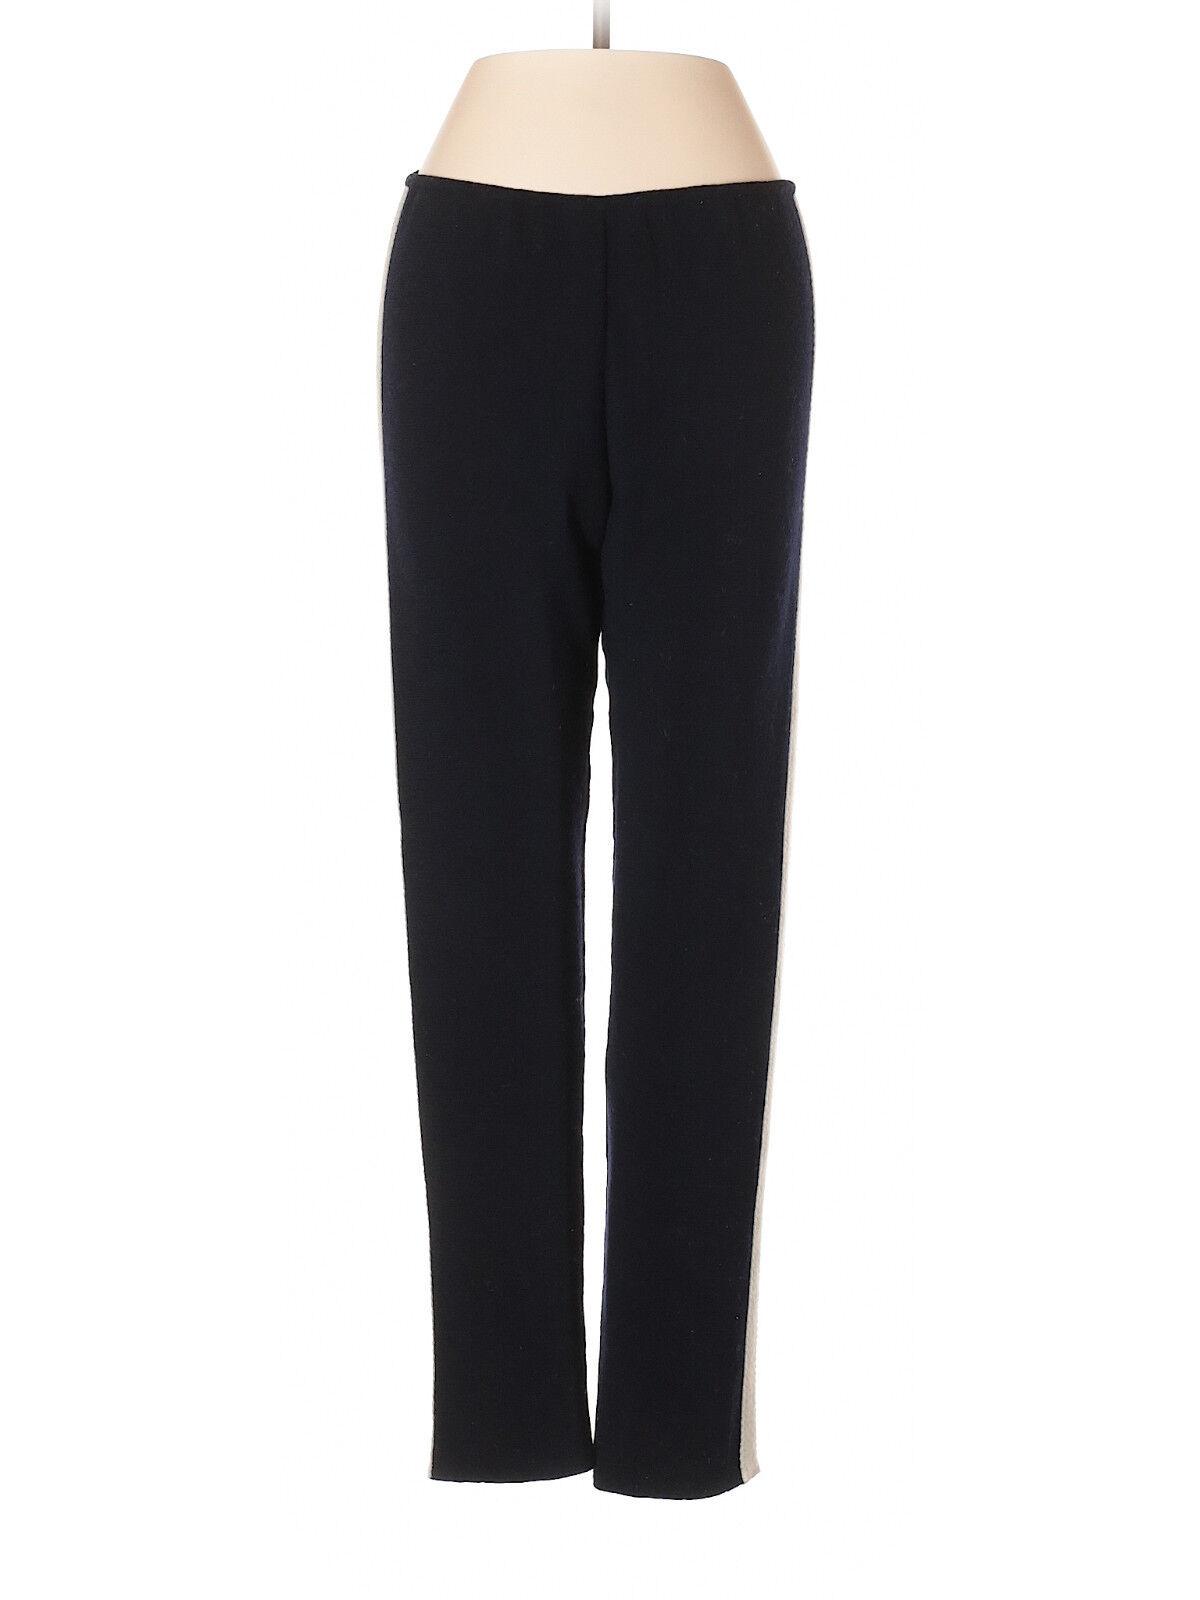 Marni bluee Wool Pants w  Tan Piping, Size 10 (US) 42 (IT)